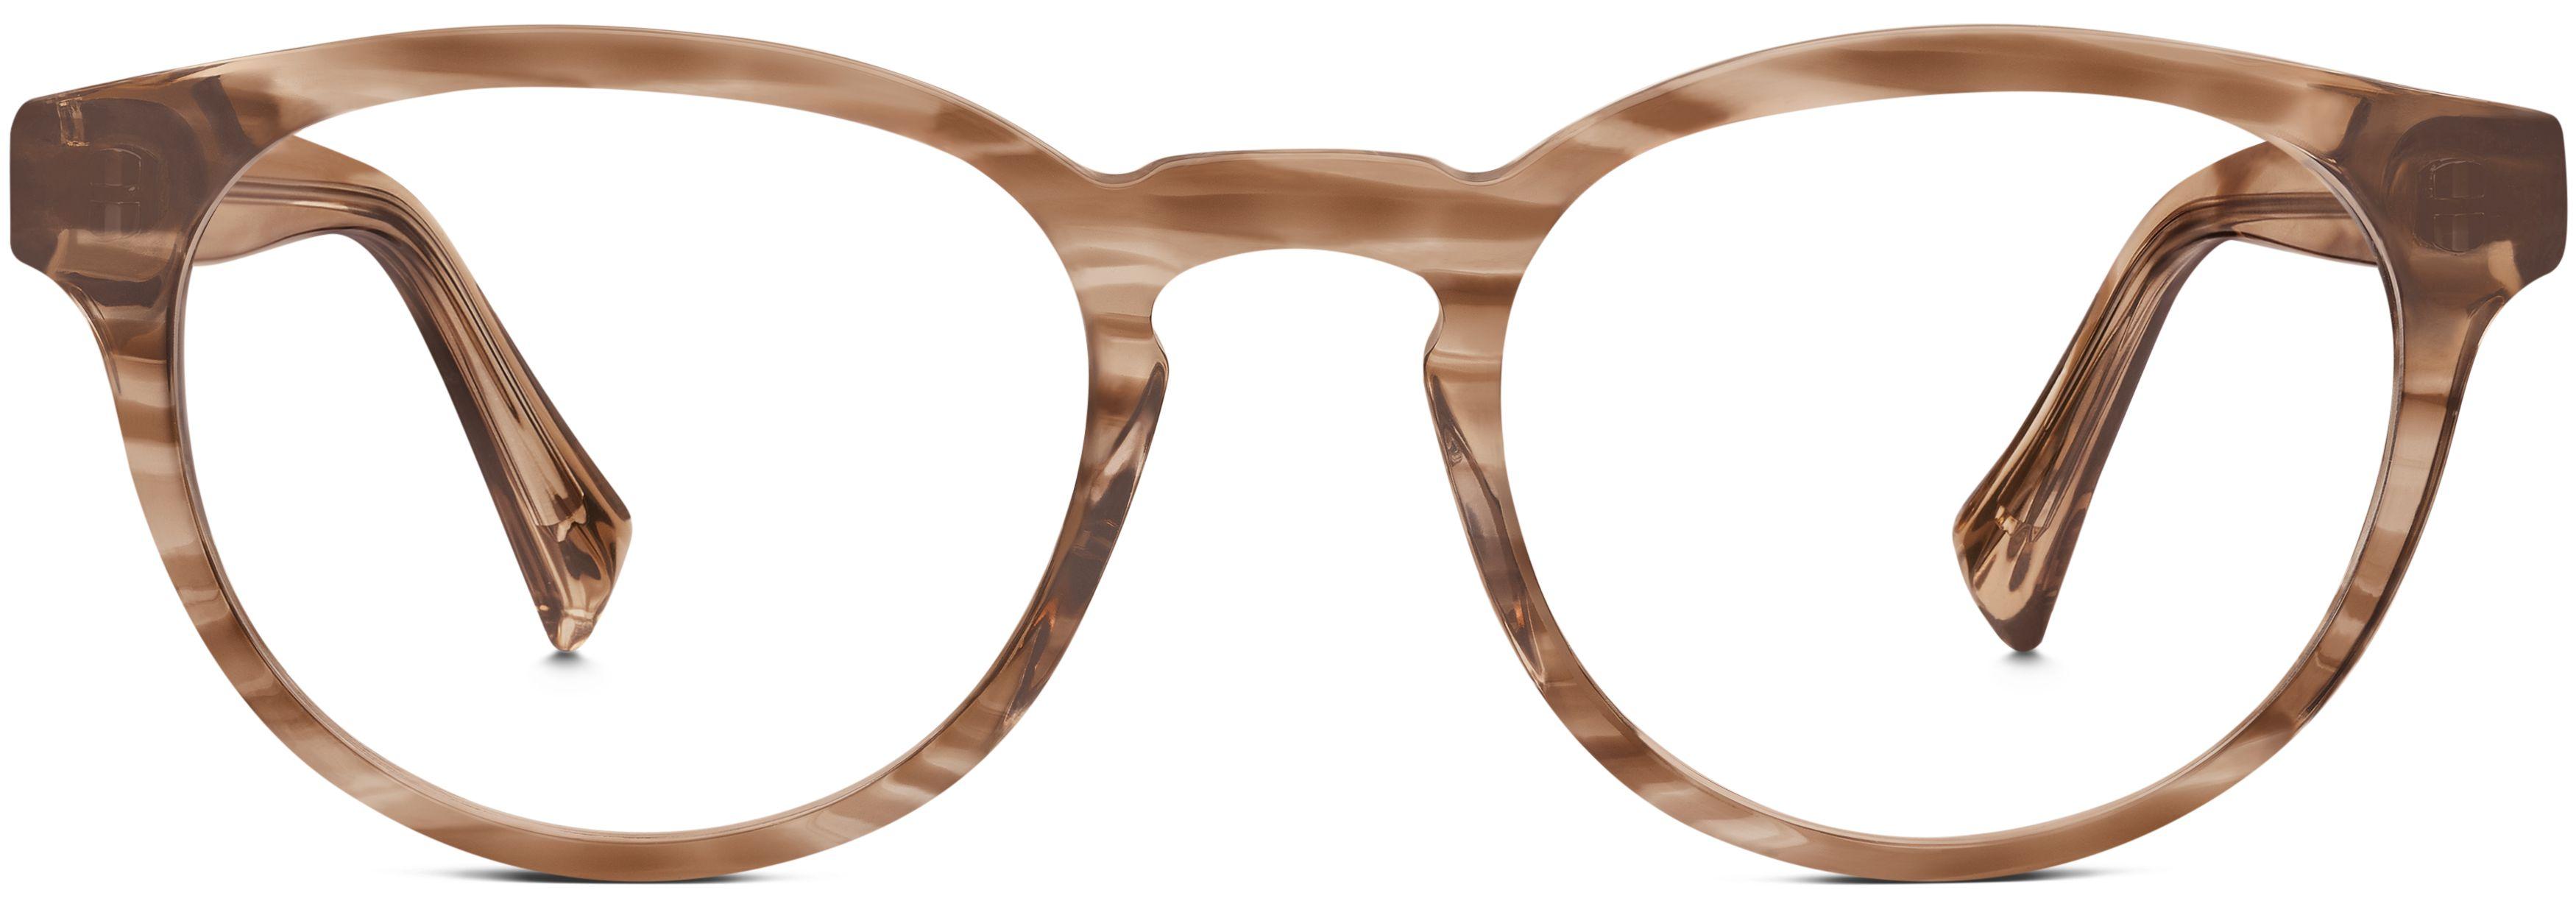 5357815ef6 Percey Eyeglasses in Chestnut Crystal for Women